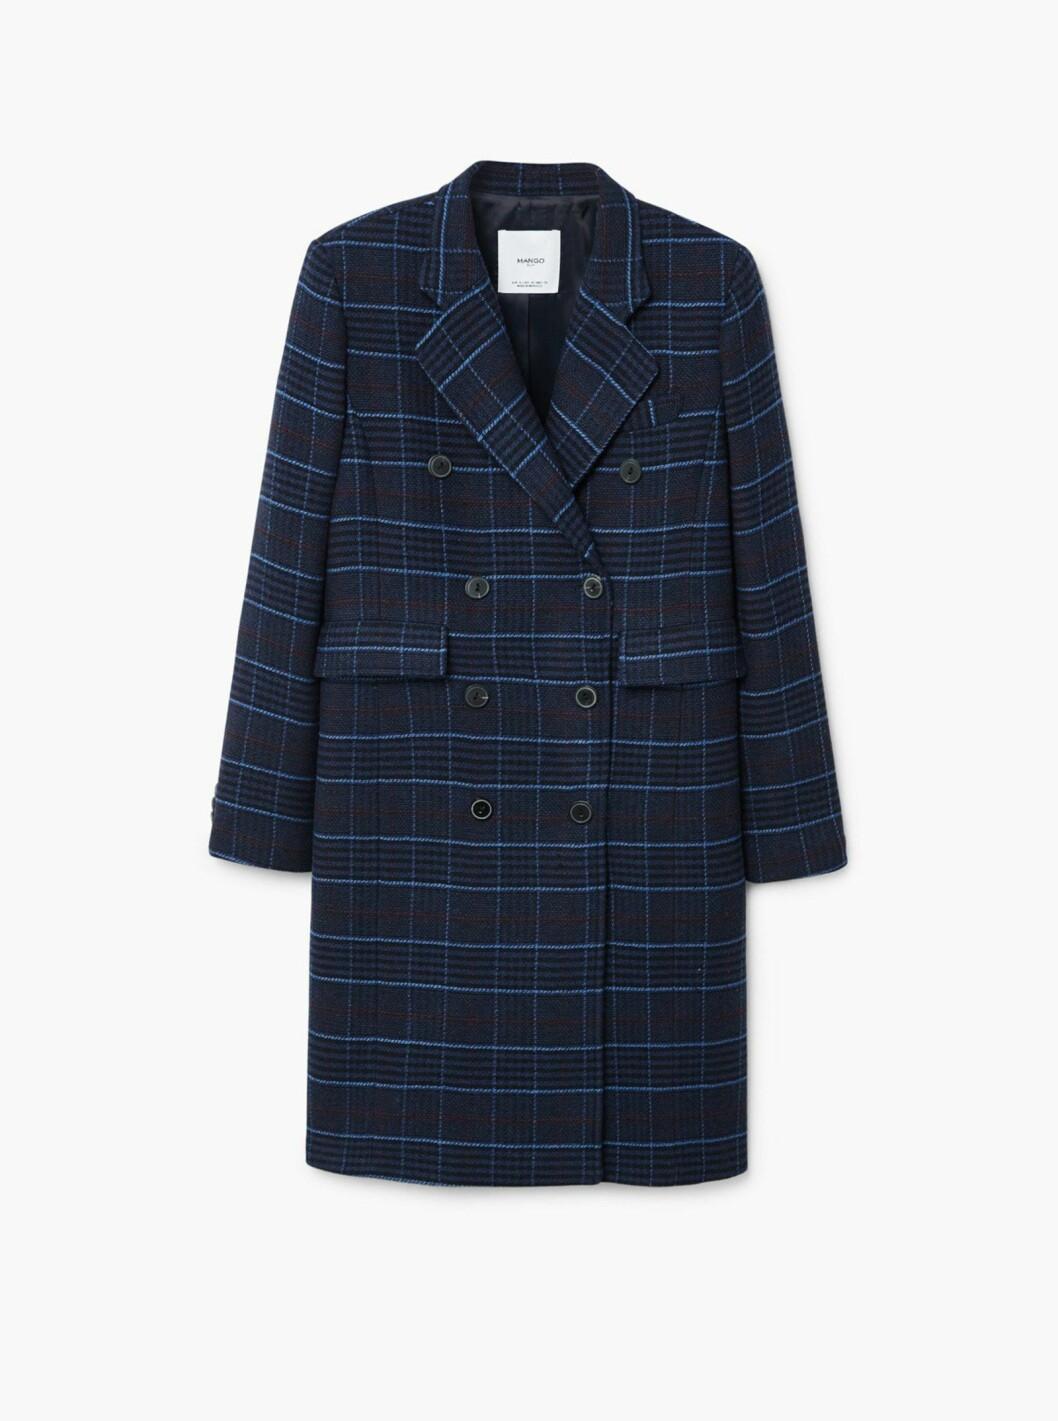 Kåpe fra Mango |1400,-| https://shop.mango.com/no-en/women/coats-coats/checked-structured-coat_31035730.html?c=69&n=1&s=prendas_she.familia;15